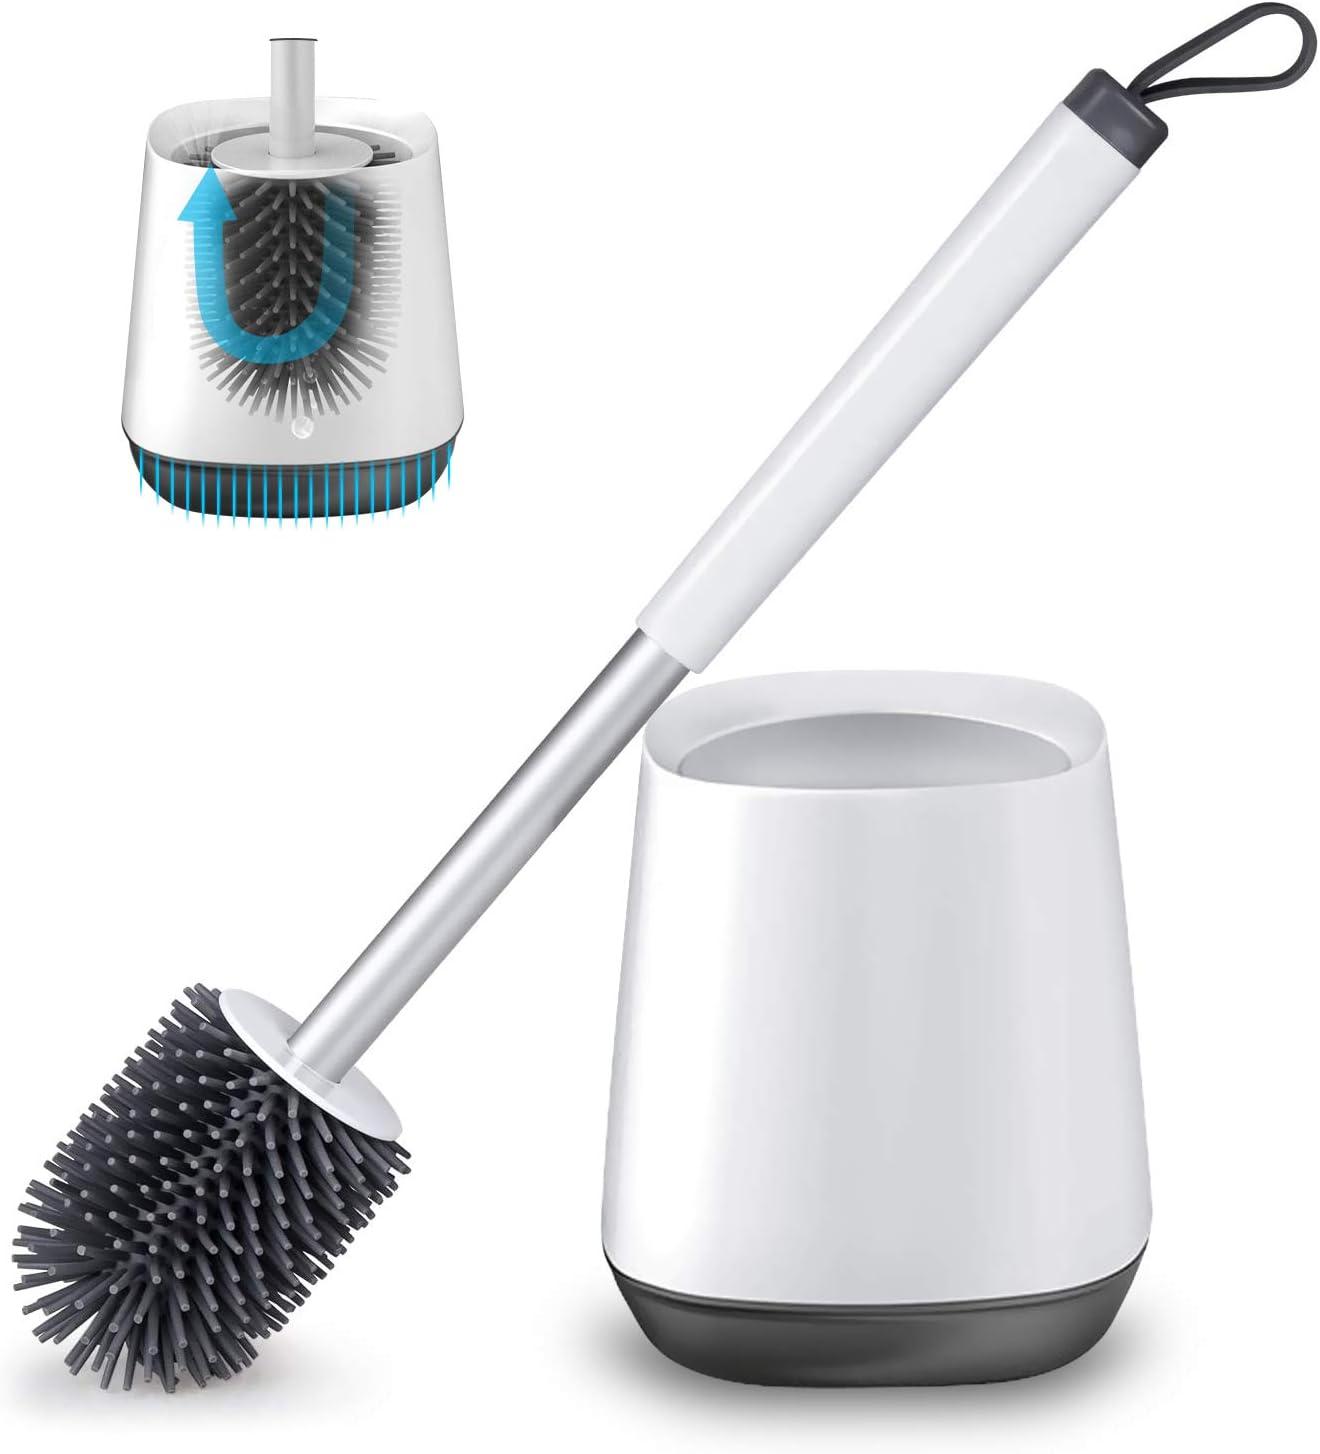 IADZ Toilet Brush,Stainless Steel Toilet Brush Set Colorful Toilet Bowl Brush with Holder Toilet Cleaning Brush